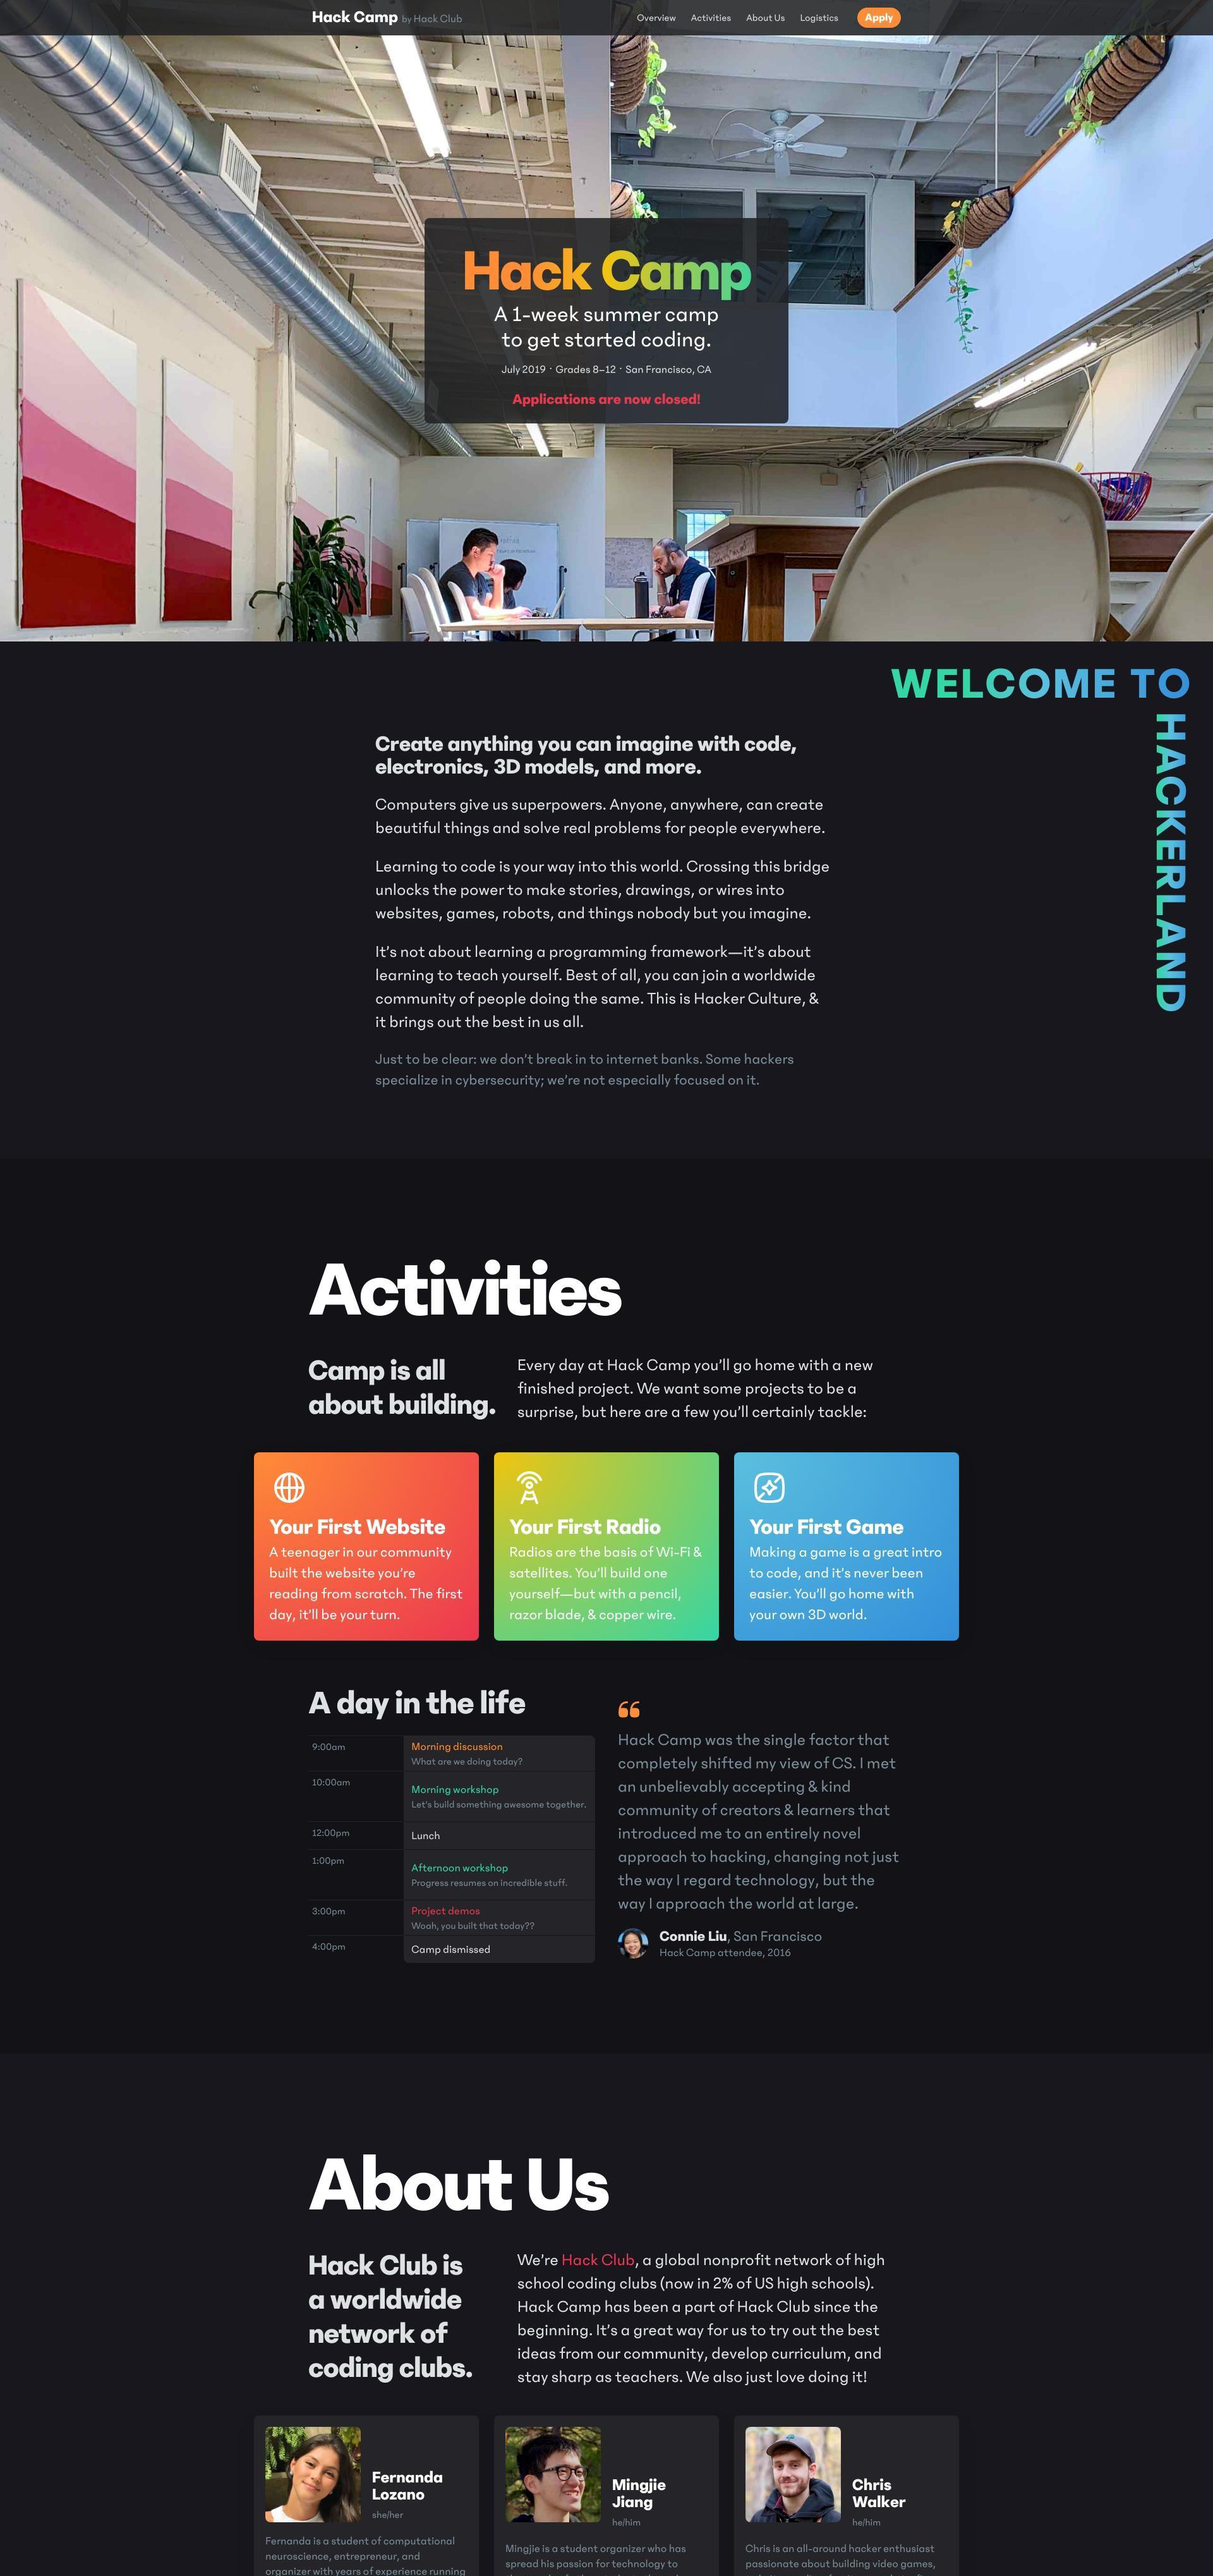 Hack Camp website screenshot